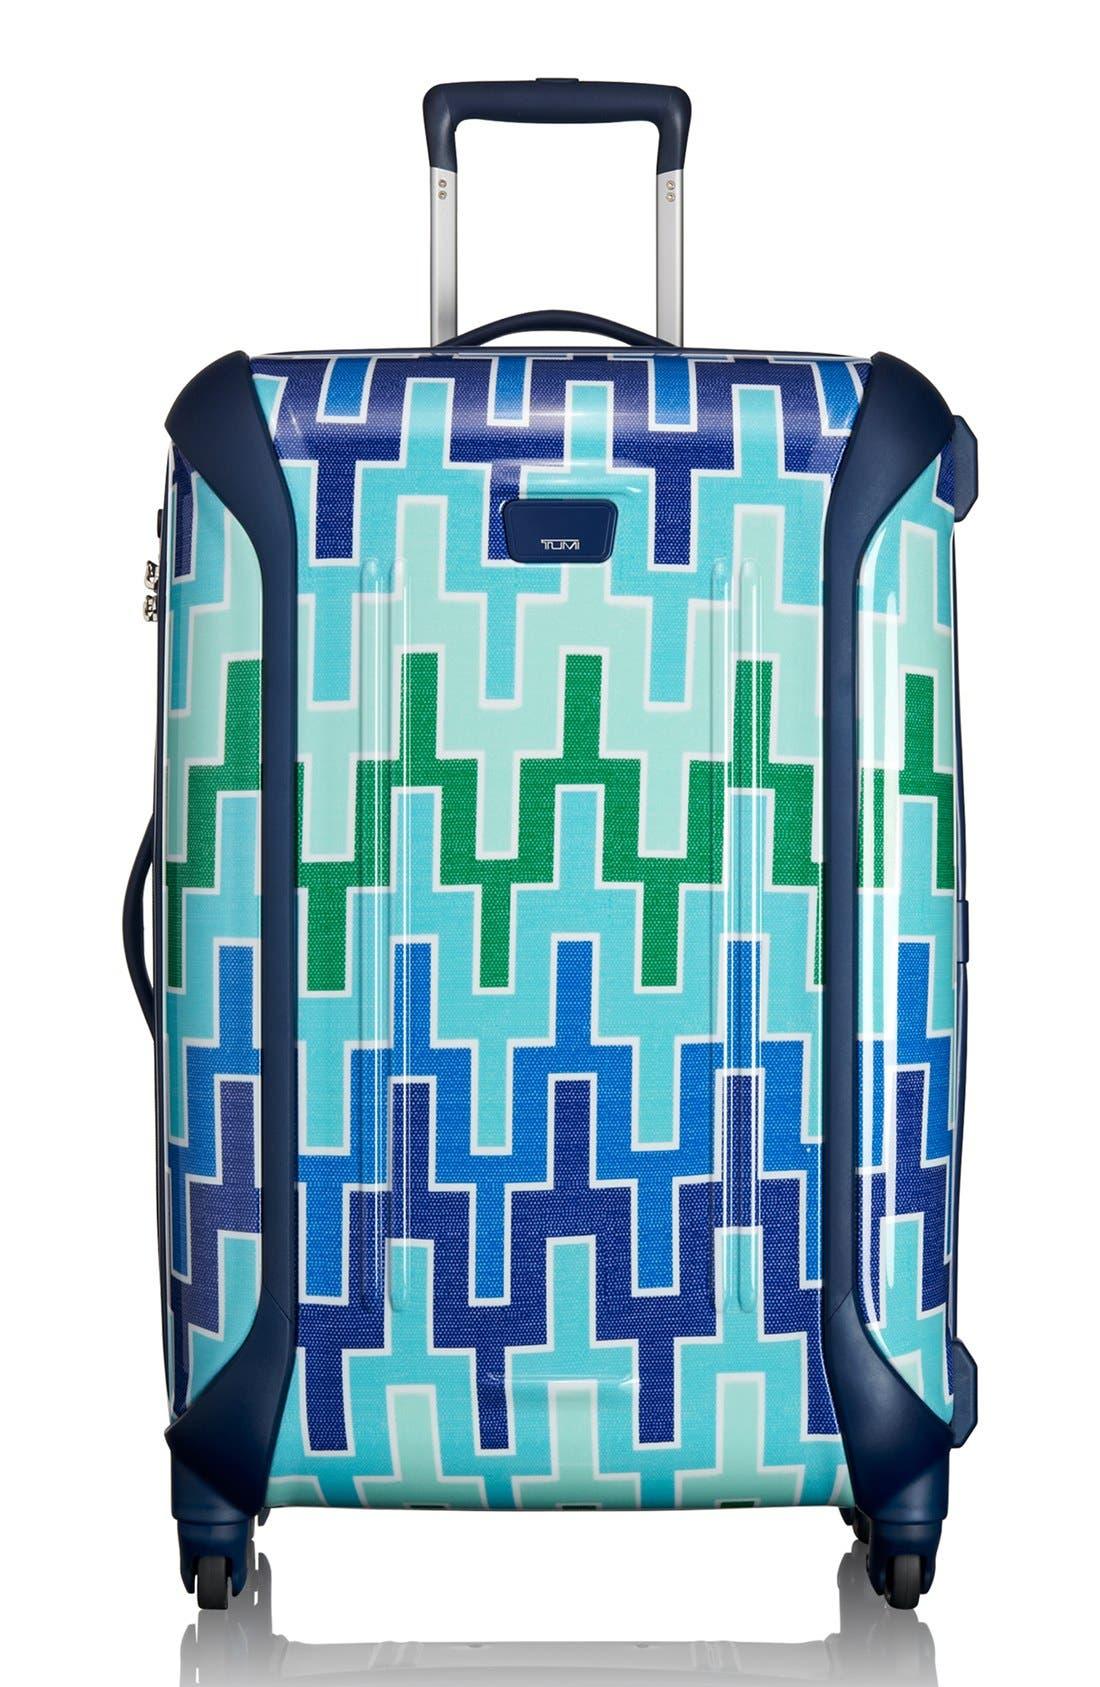 Alternate Image 1 Selected - Tumi 'Vapor™ - Jonathan Adler' Medium Trip Packing Case